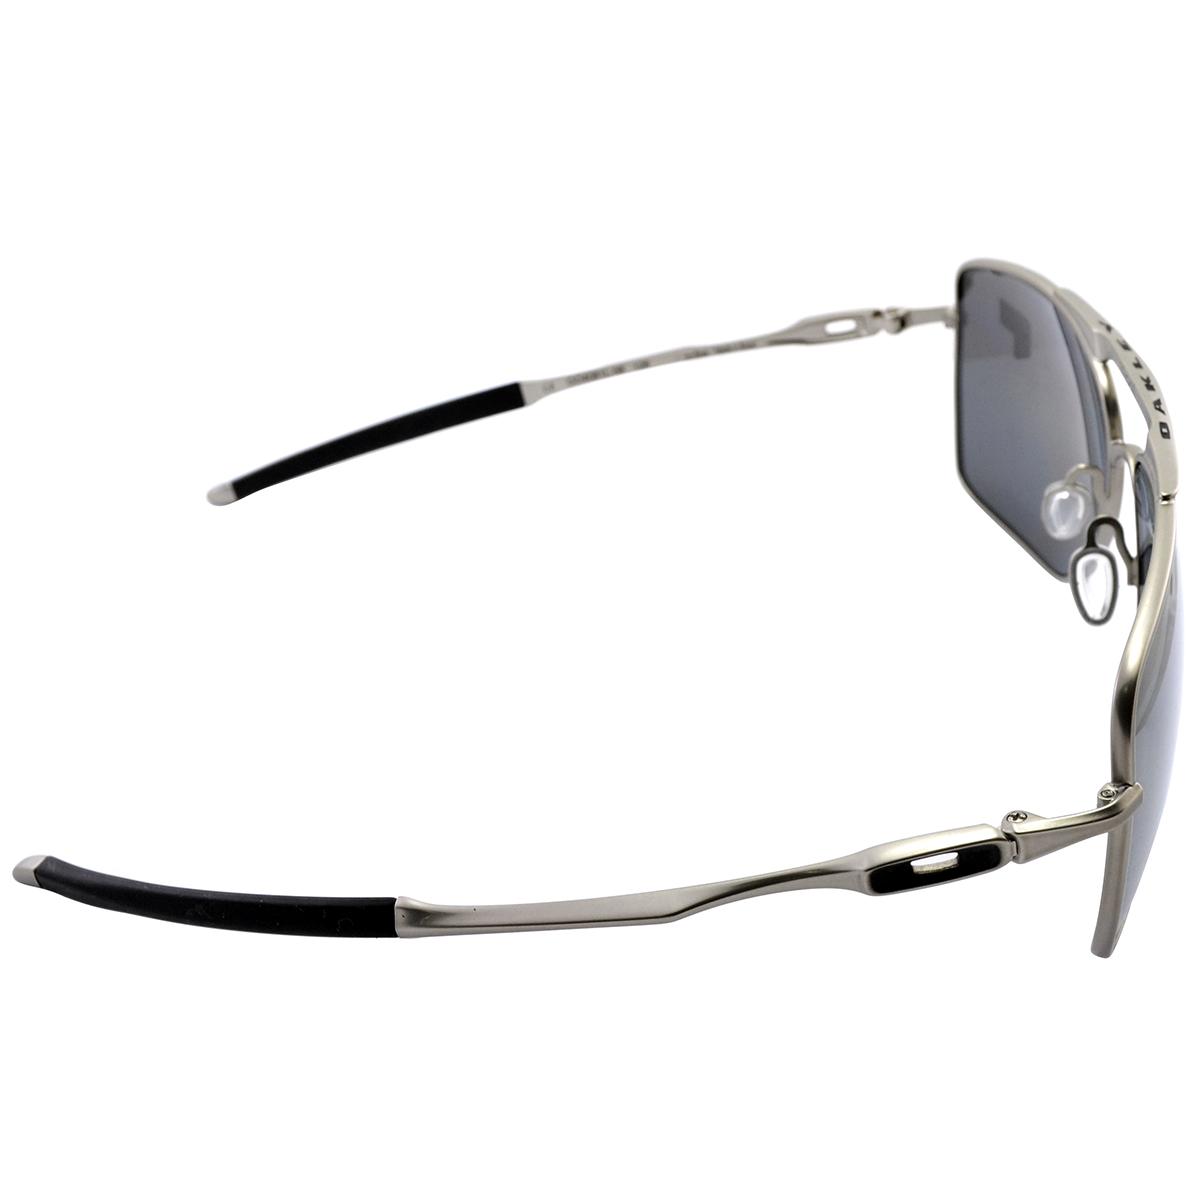 ... Óculos Oakley Deviation Light W Black Iridium Polarizado PROMOÇAO ... b6ad81a972